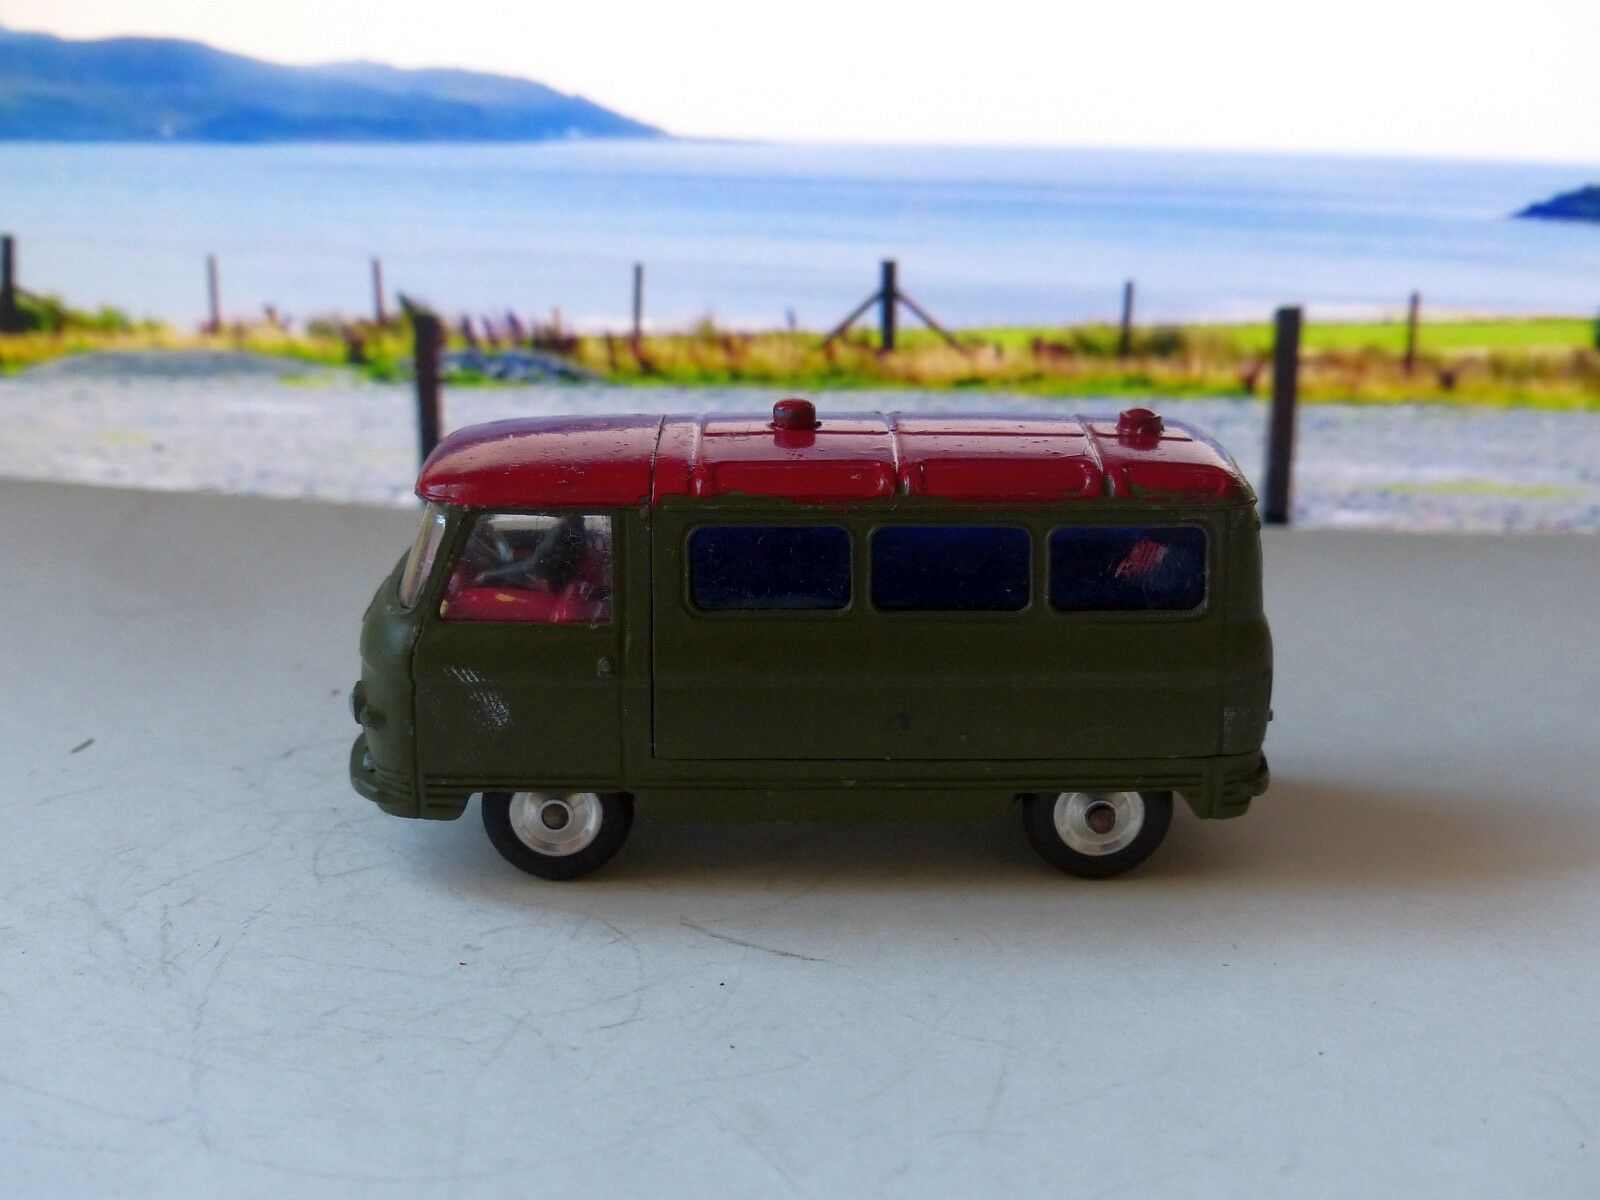 Corgi Toys 354 Military Ambulance with original box